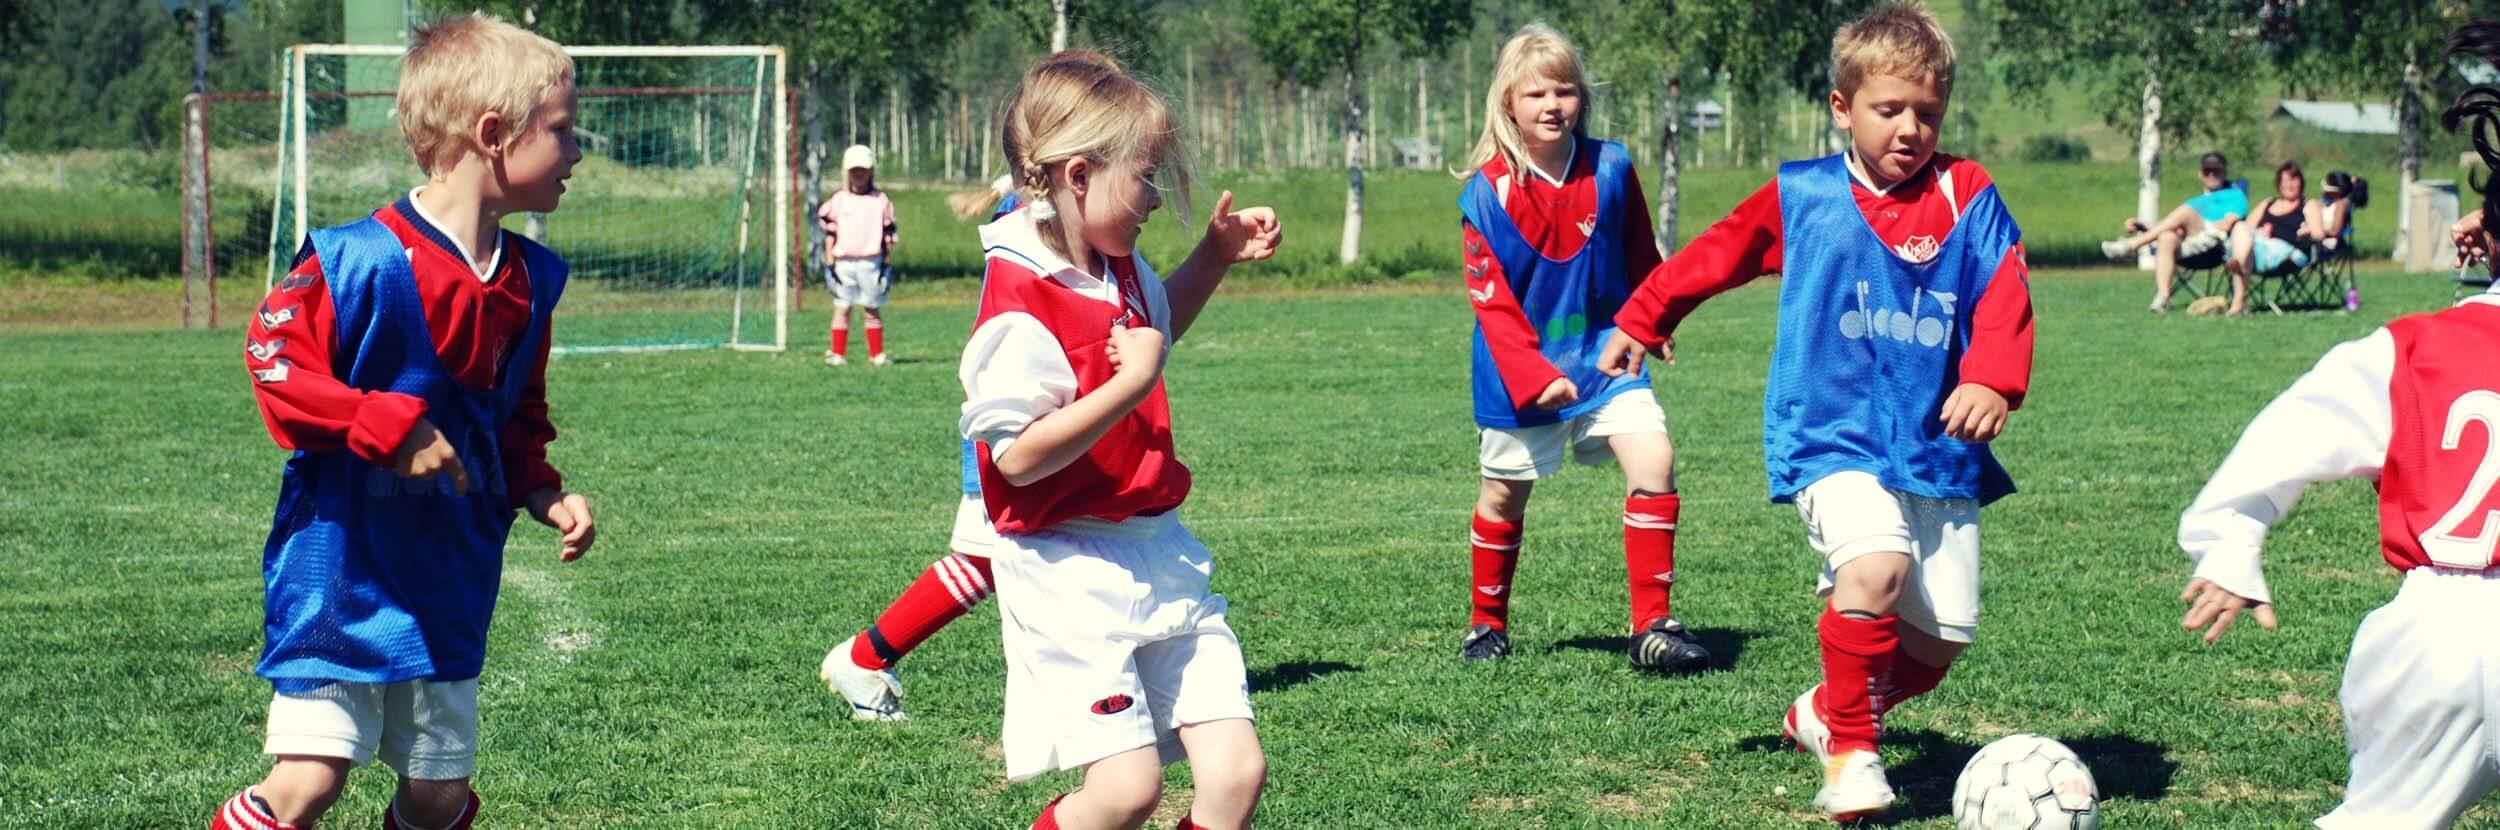 Anundsjö barn fotball.jpg